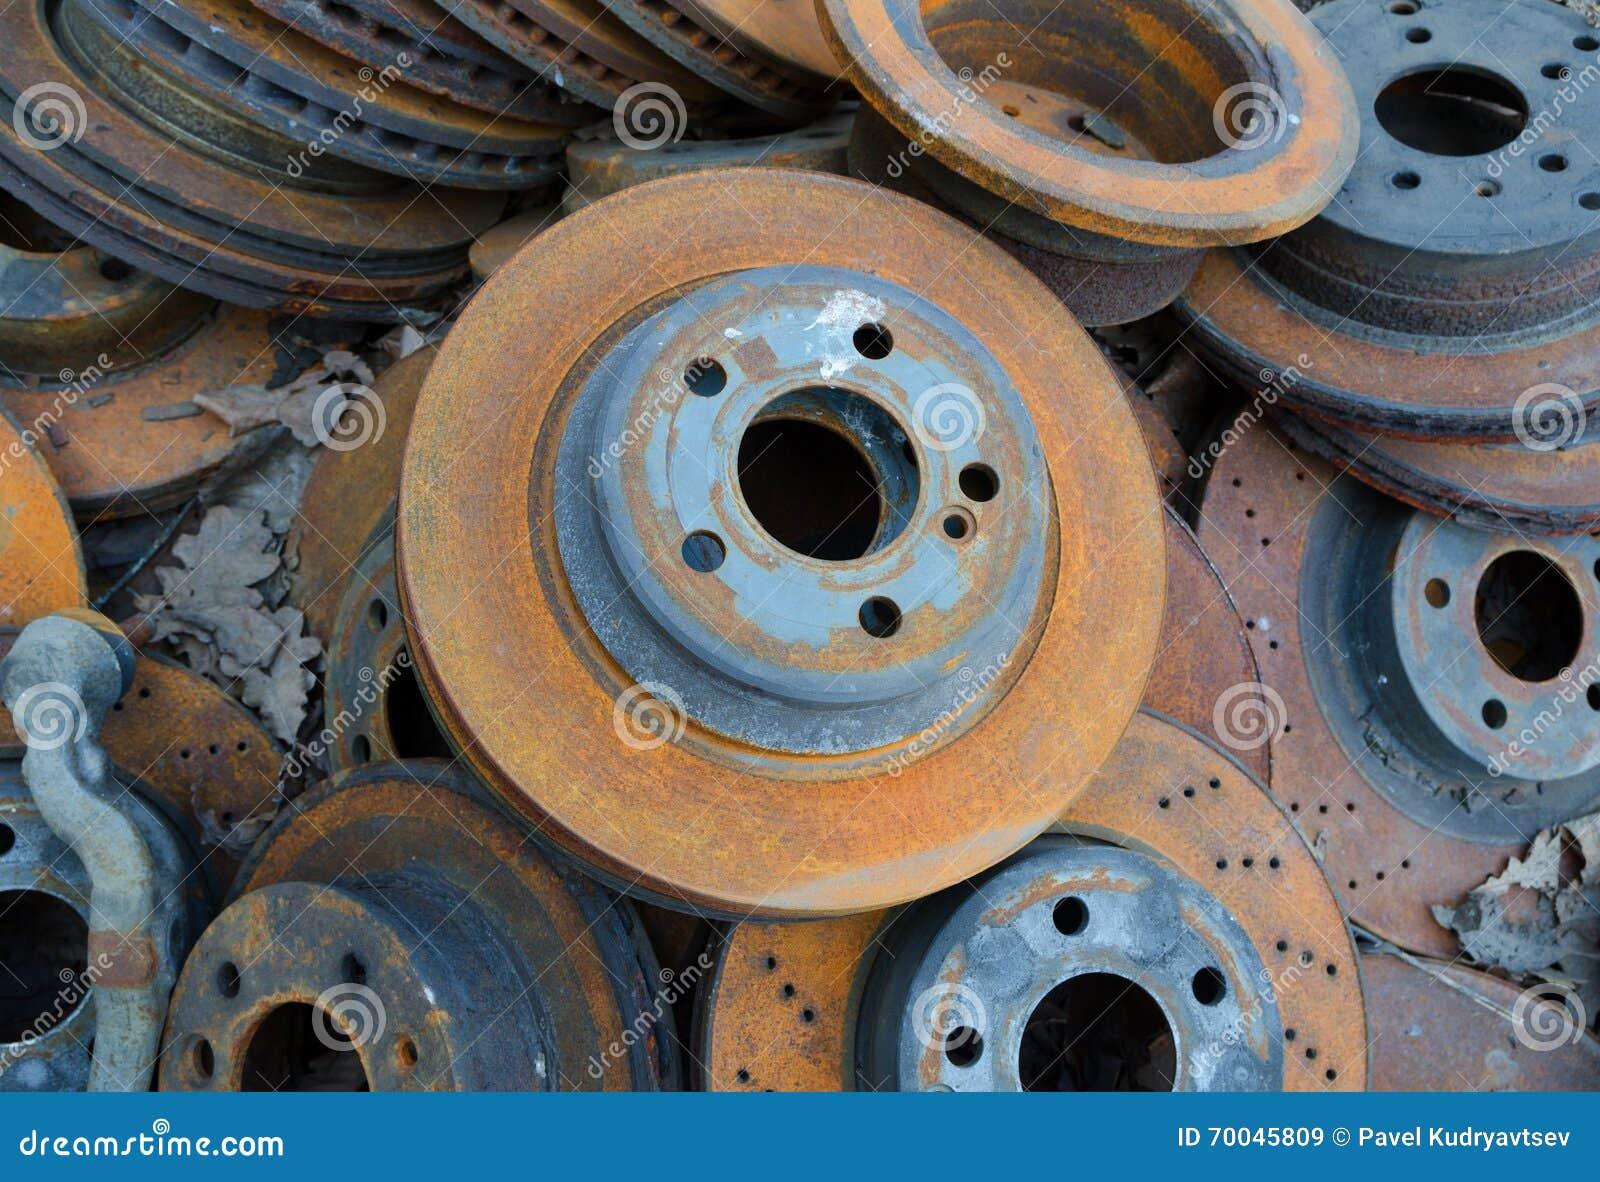 Useless, Old Rusty Brake Discs Stock Image - Image: 70045809